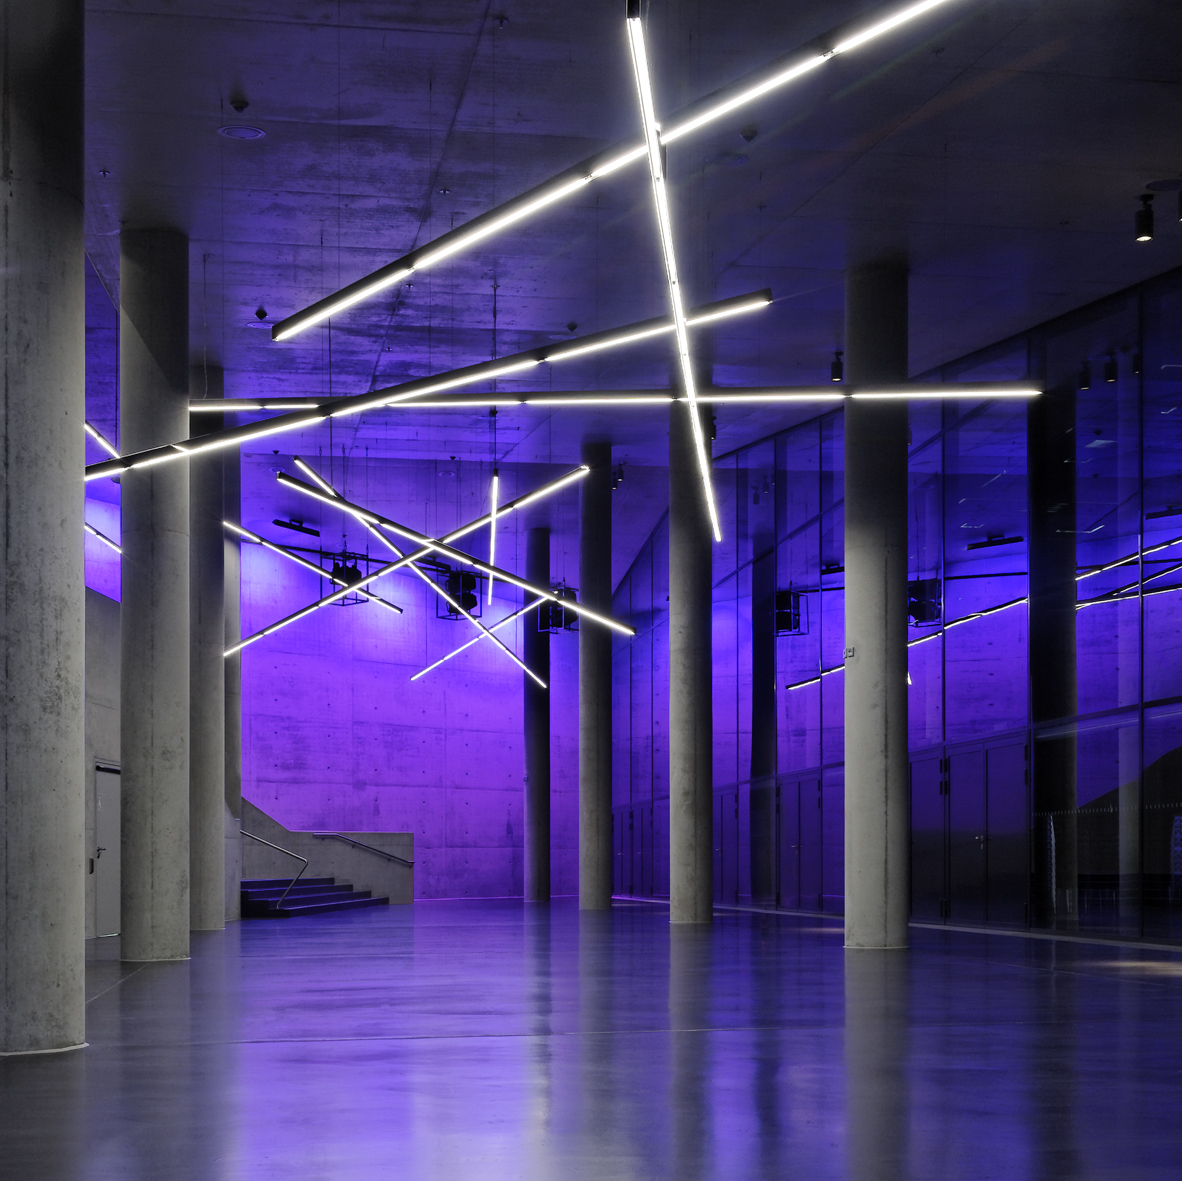 Projeto de Iluminação: Small Olympic Hall / Pfarré Lighting Design, © Andreas J. Focke / architekturfoto.org